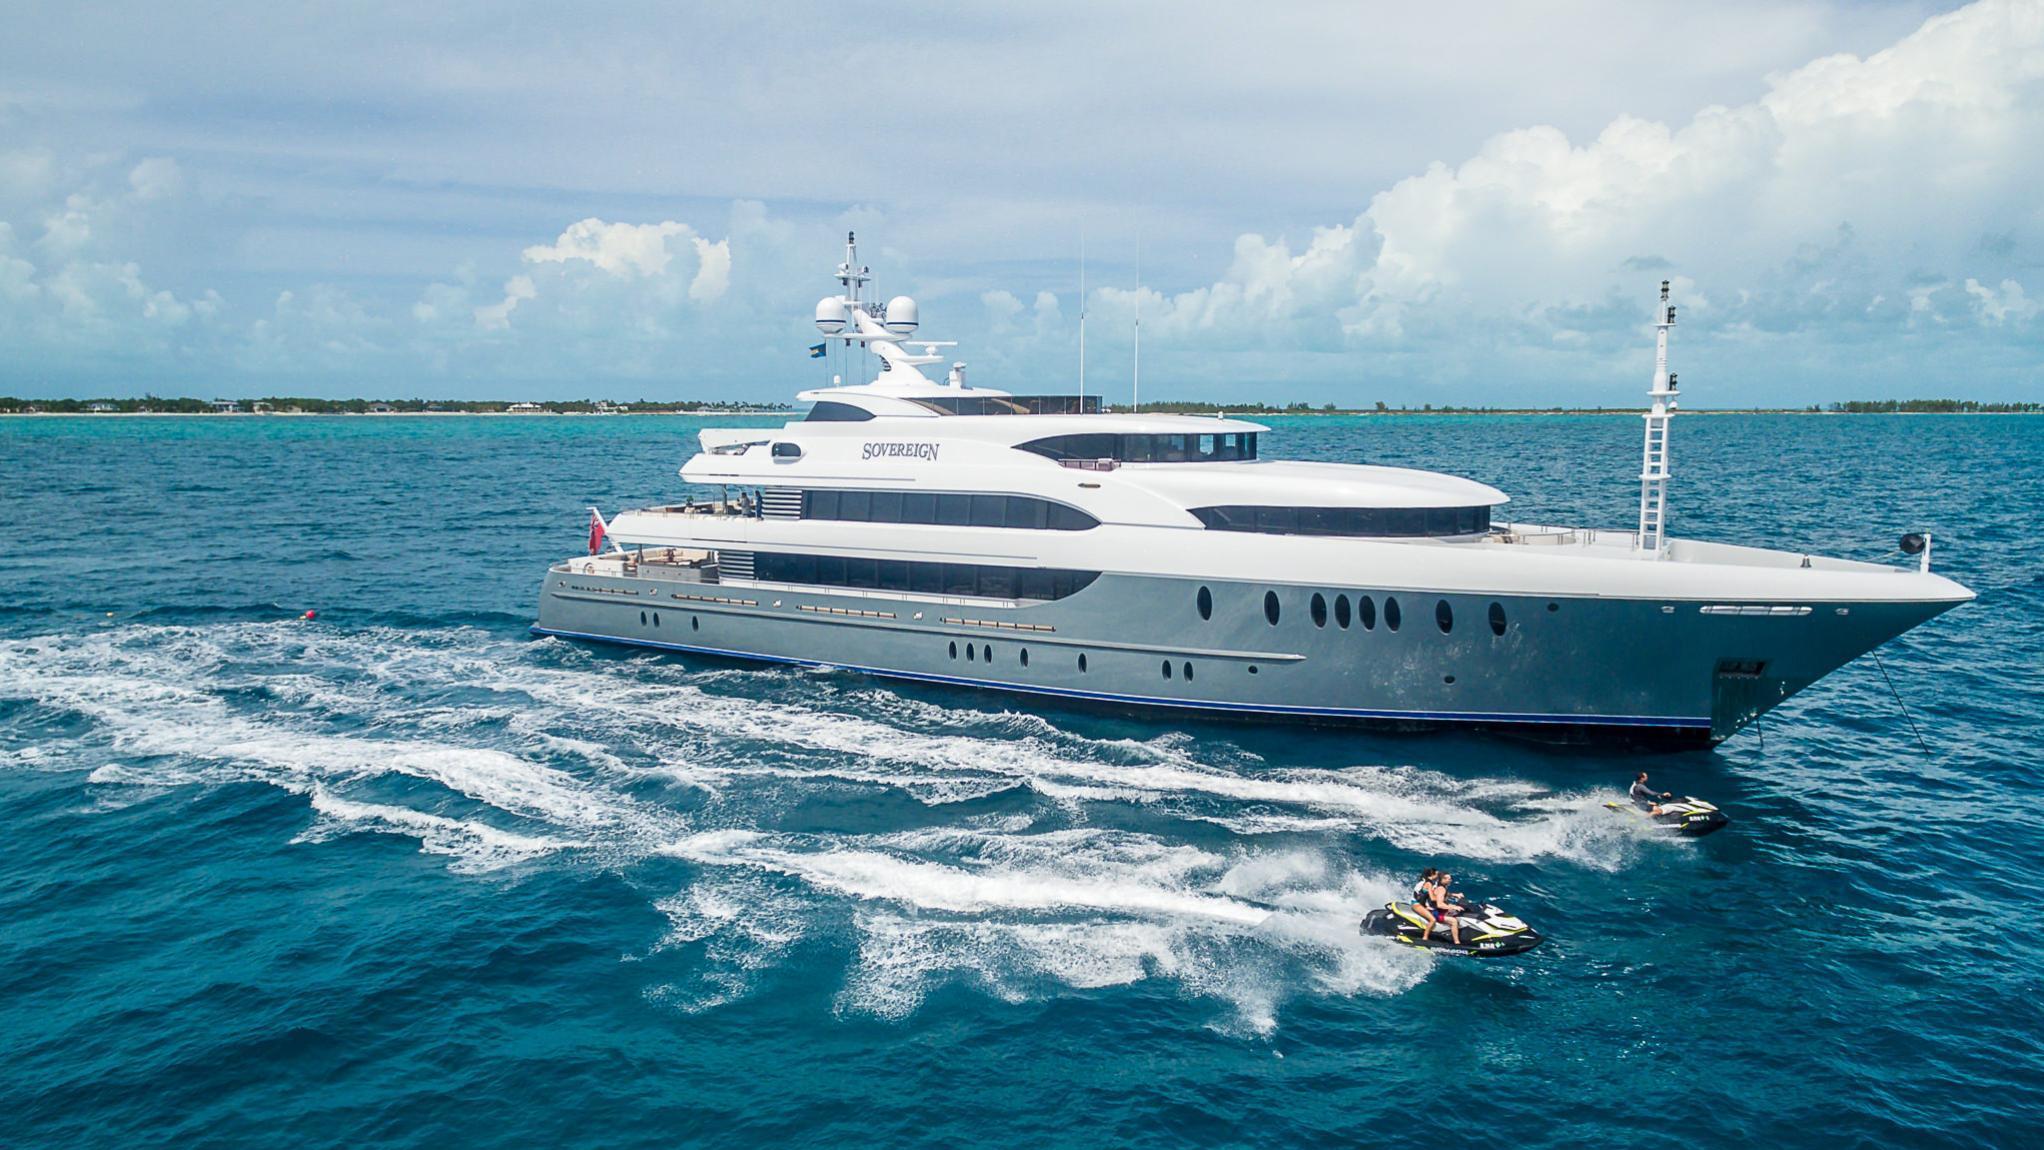 SOVEREIGN luxury superyacht